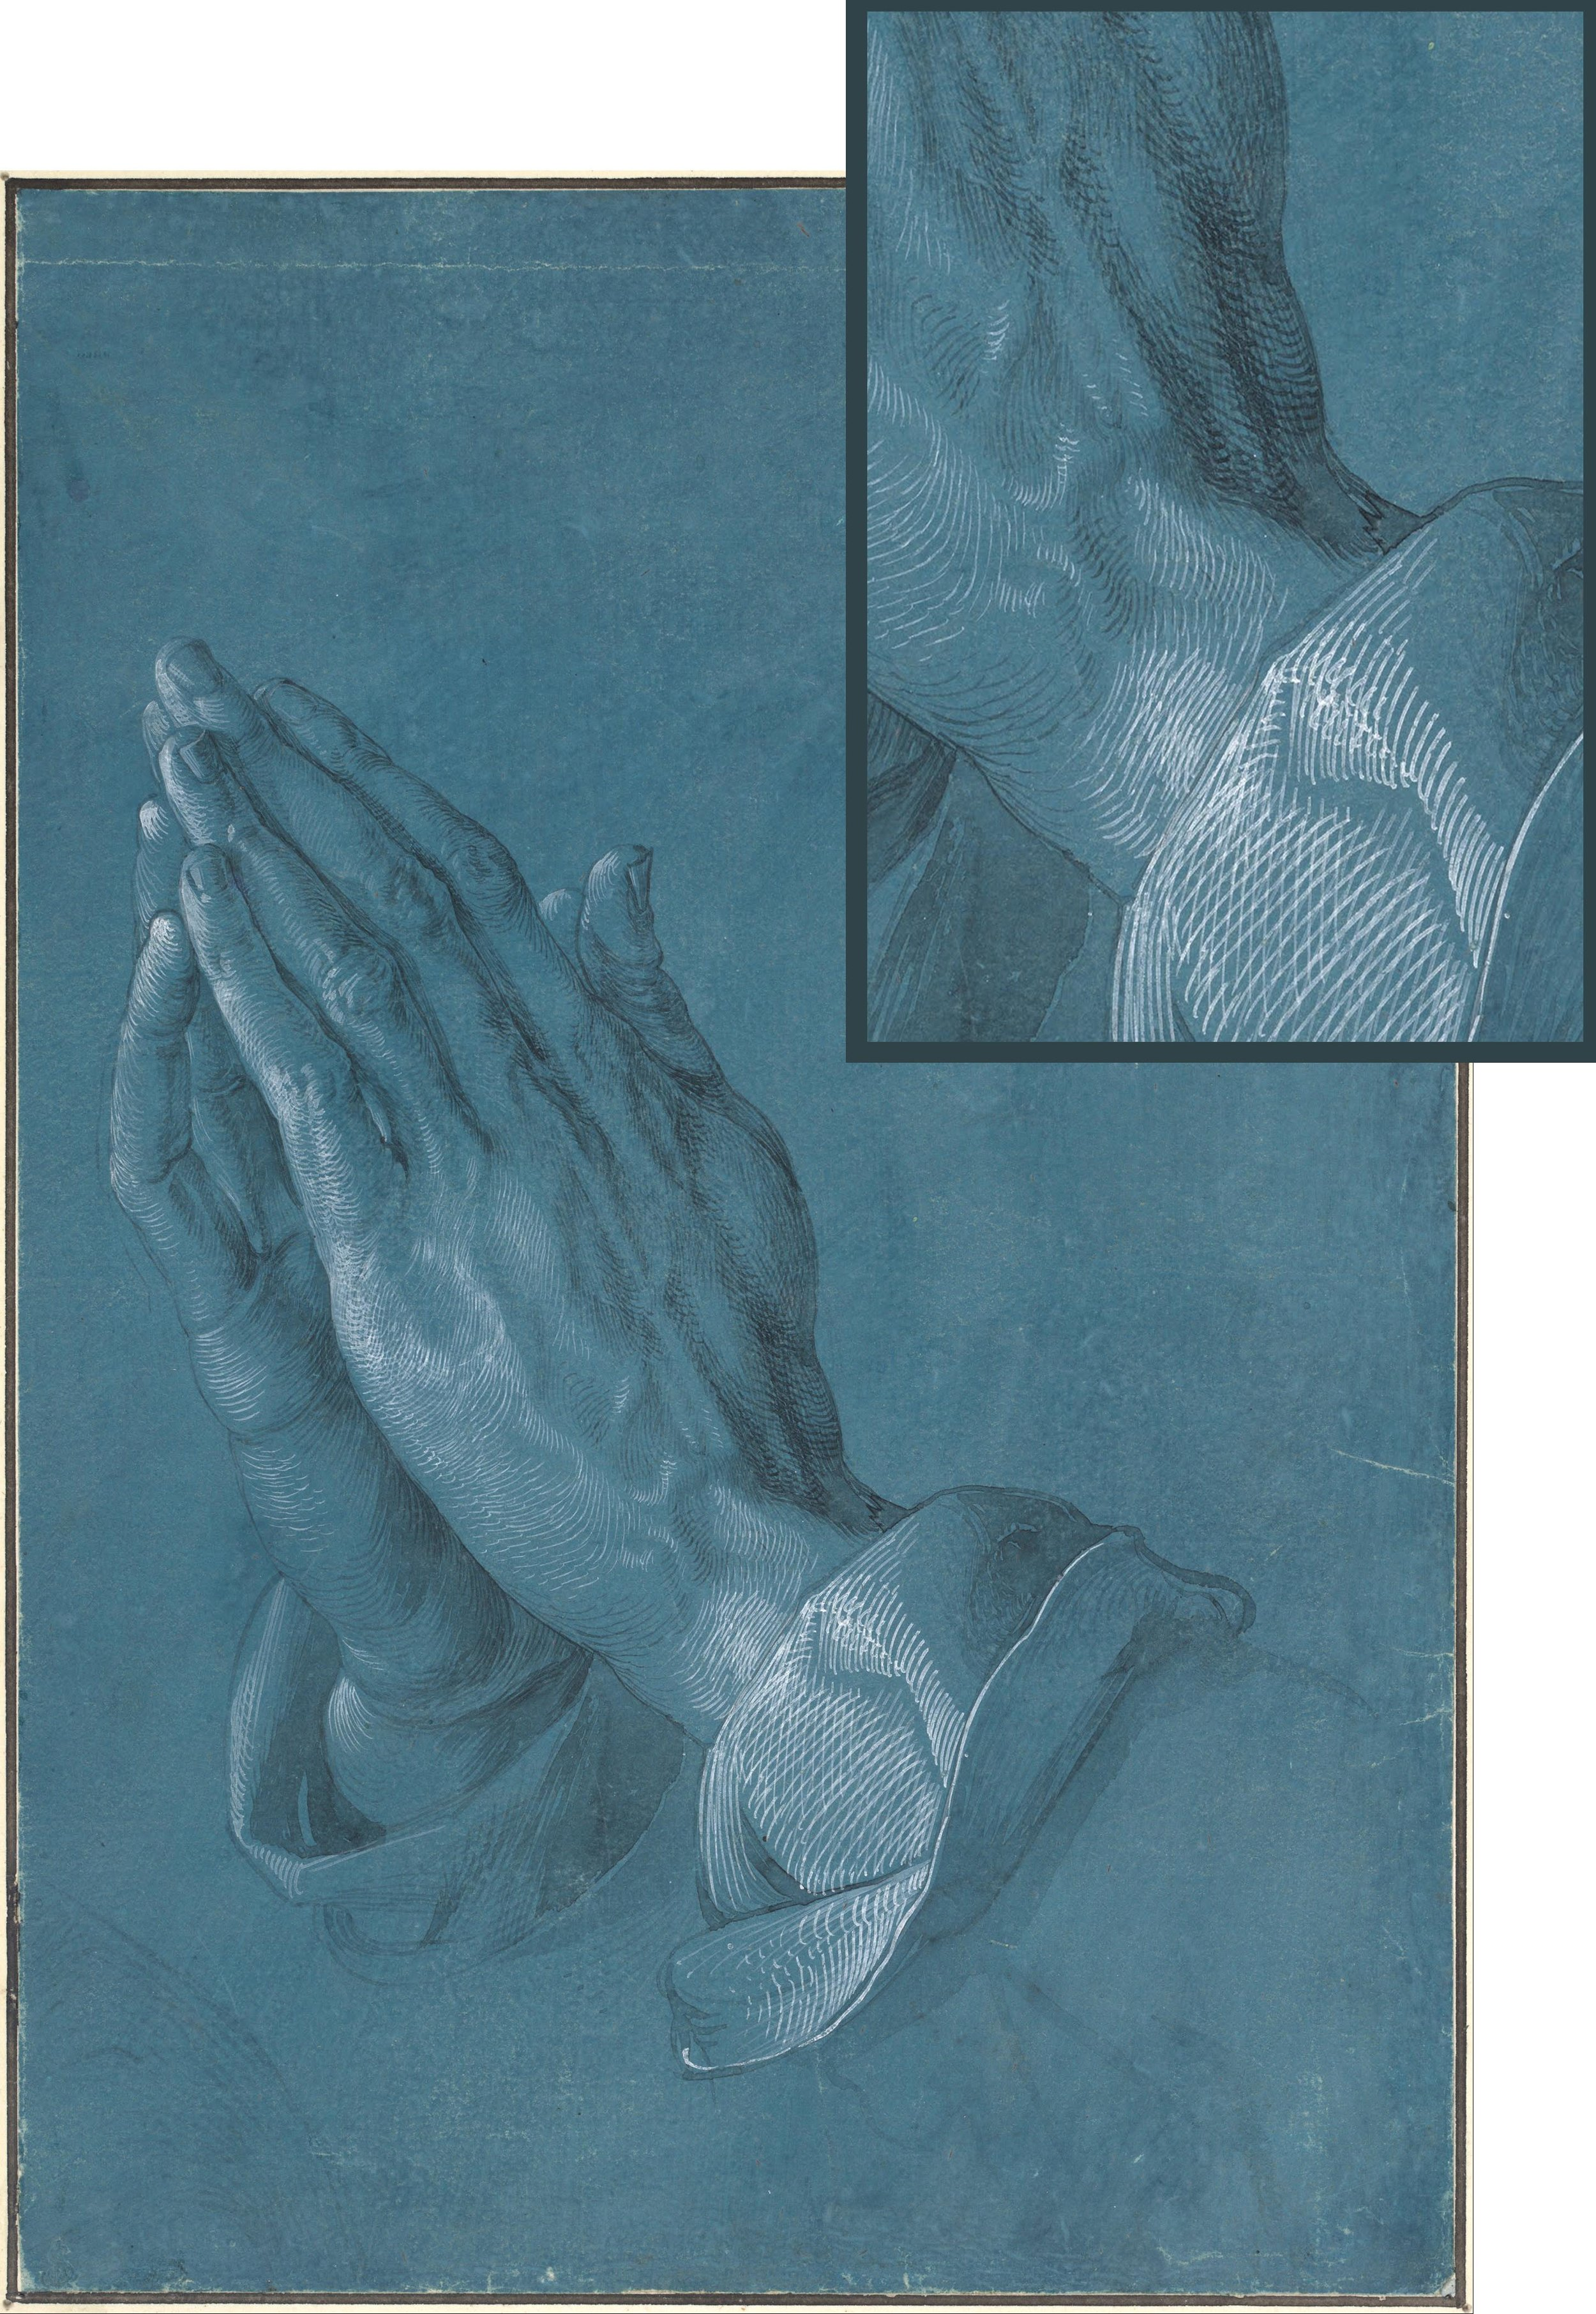 1508. Praying Hands by Albrecht Dürer - with inset showing detail